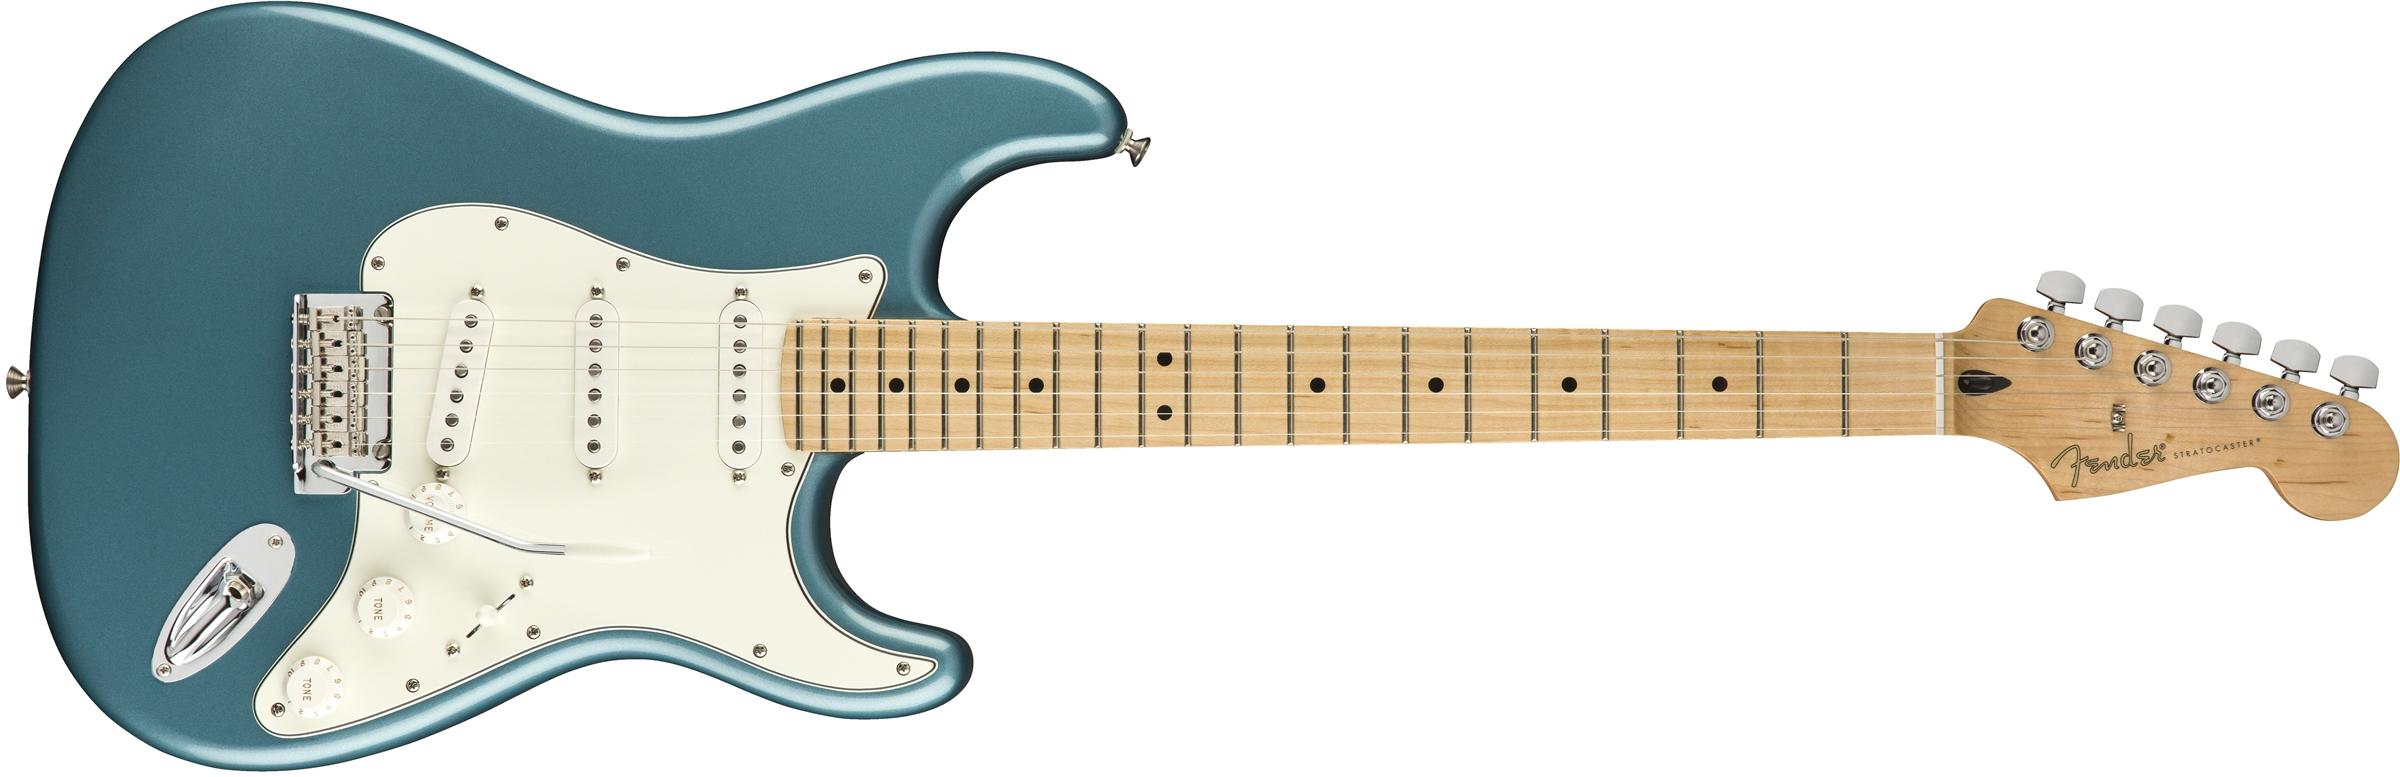 FENDER-Player-Stratocaster-MN-Tidepool-0144502513-sku-22438